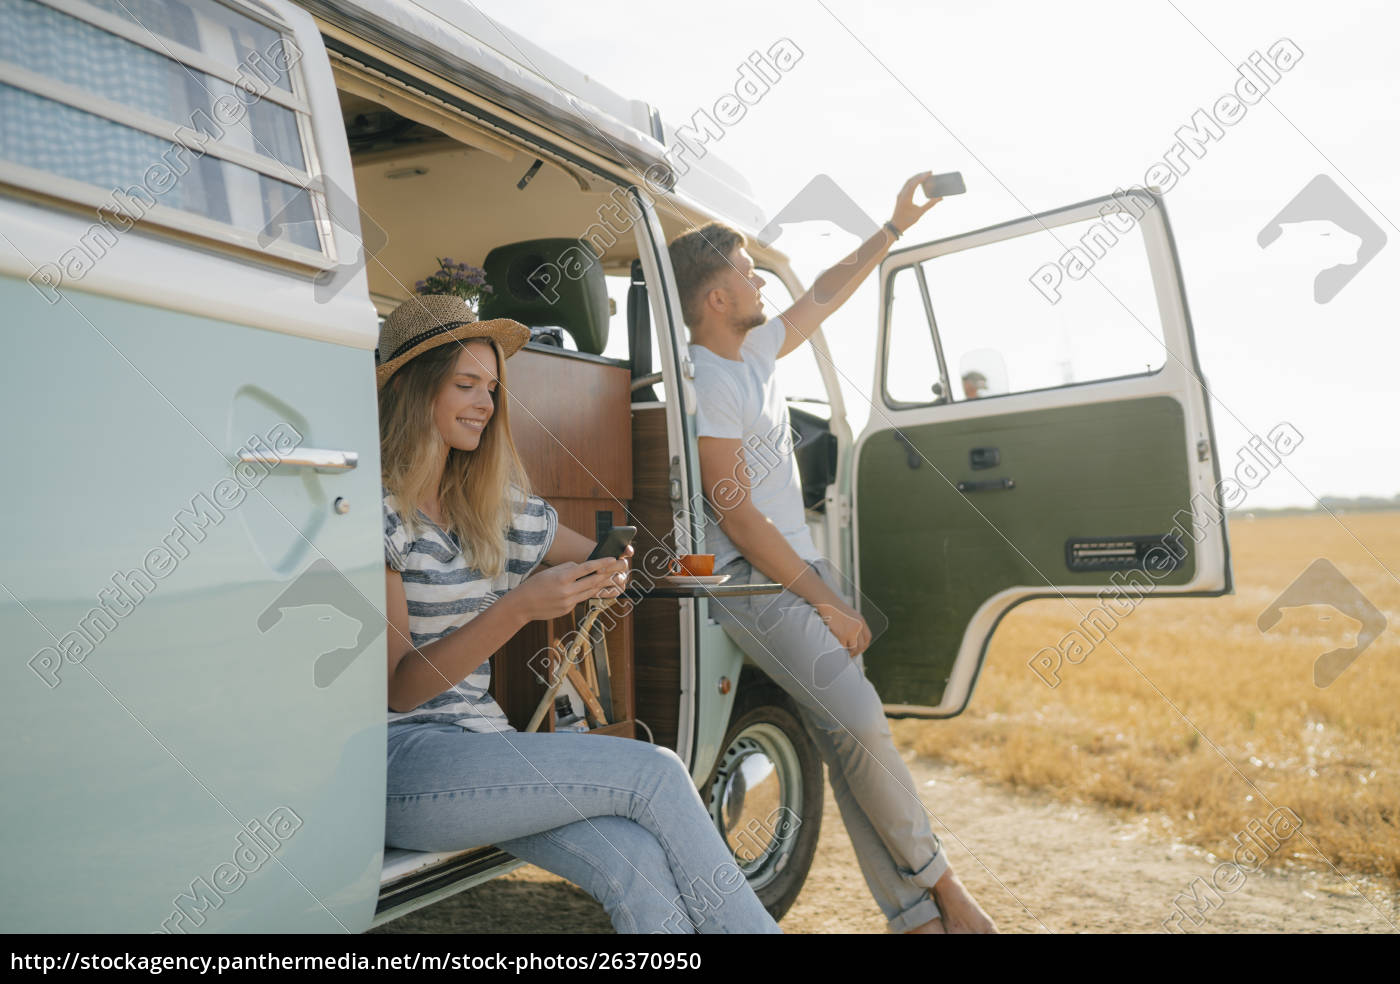 pareja, joven, con, teléfonos, celulares, relajantes - 26370950